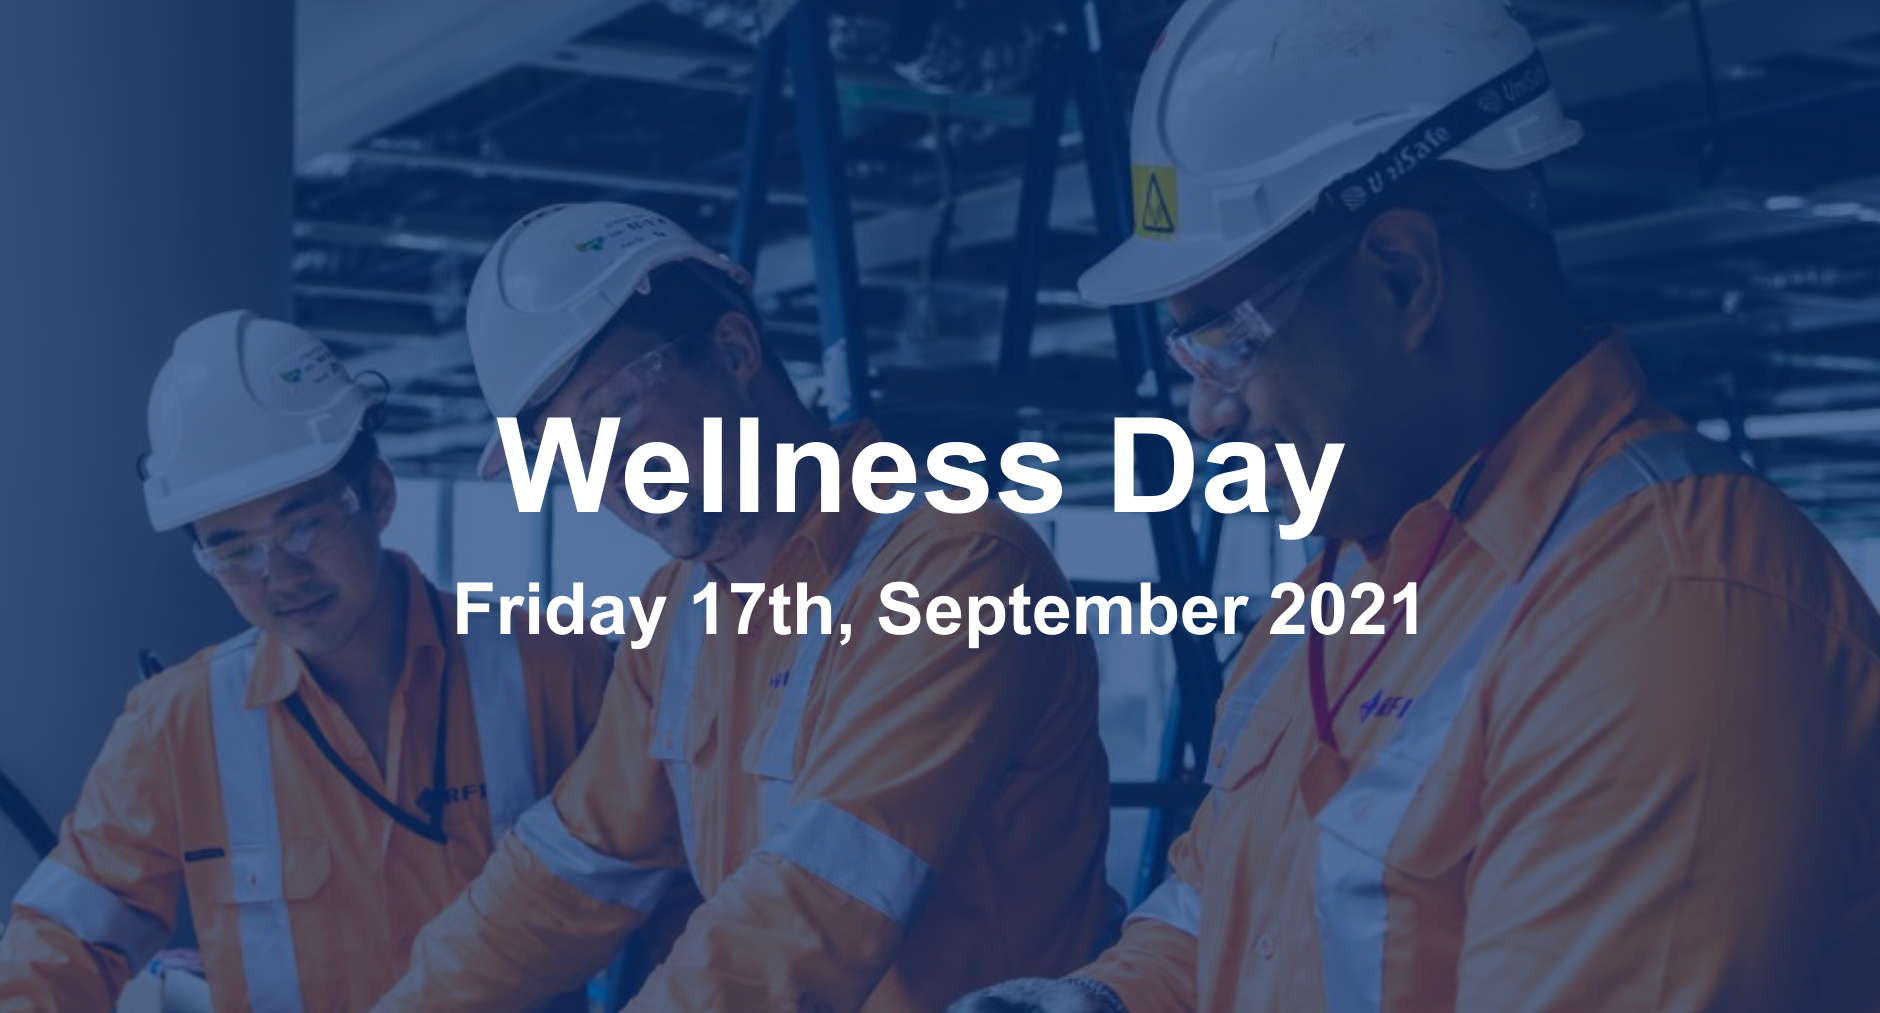 RFI Wellness Day